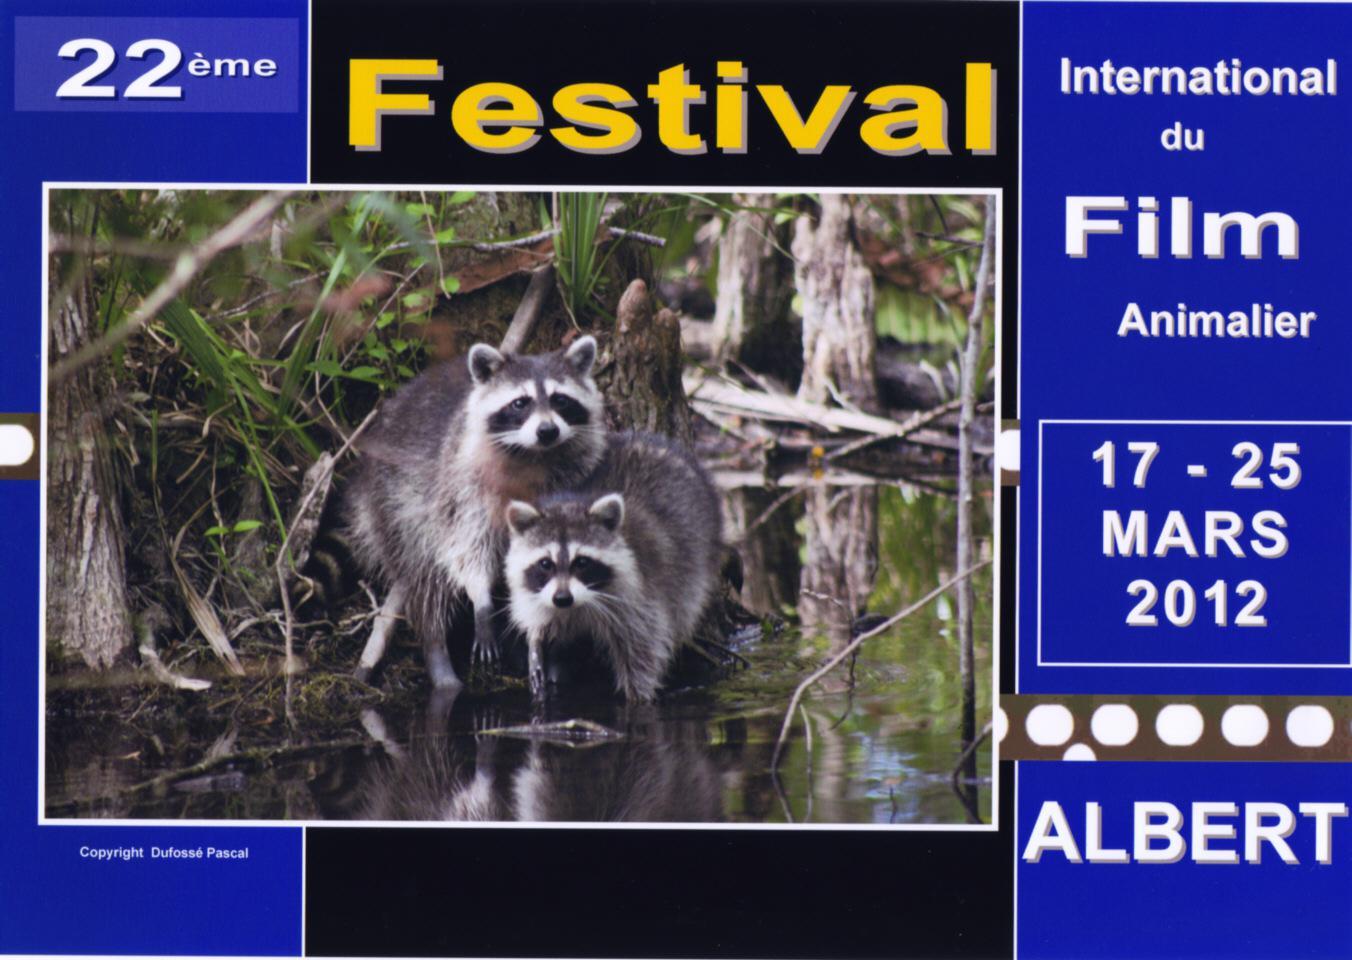 Festival International du Film Animalier